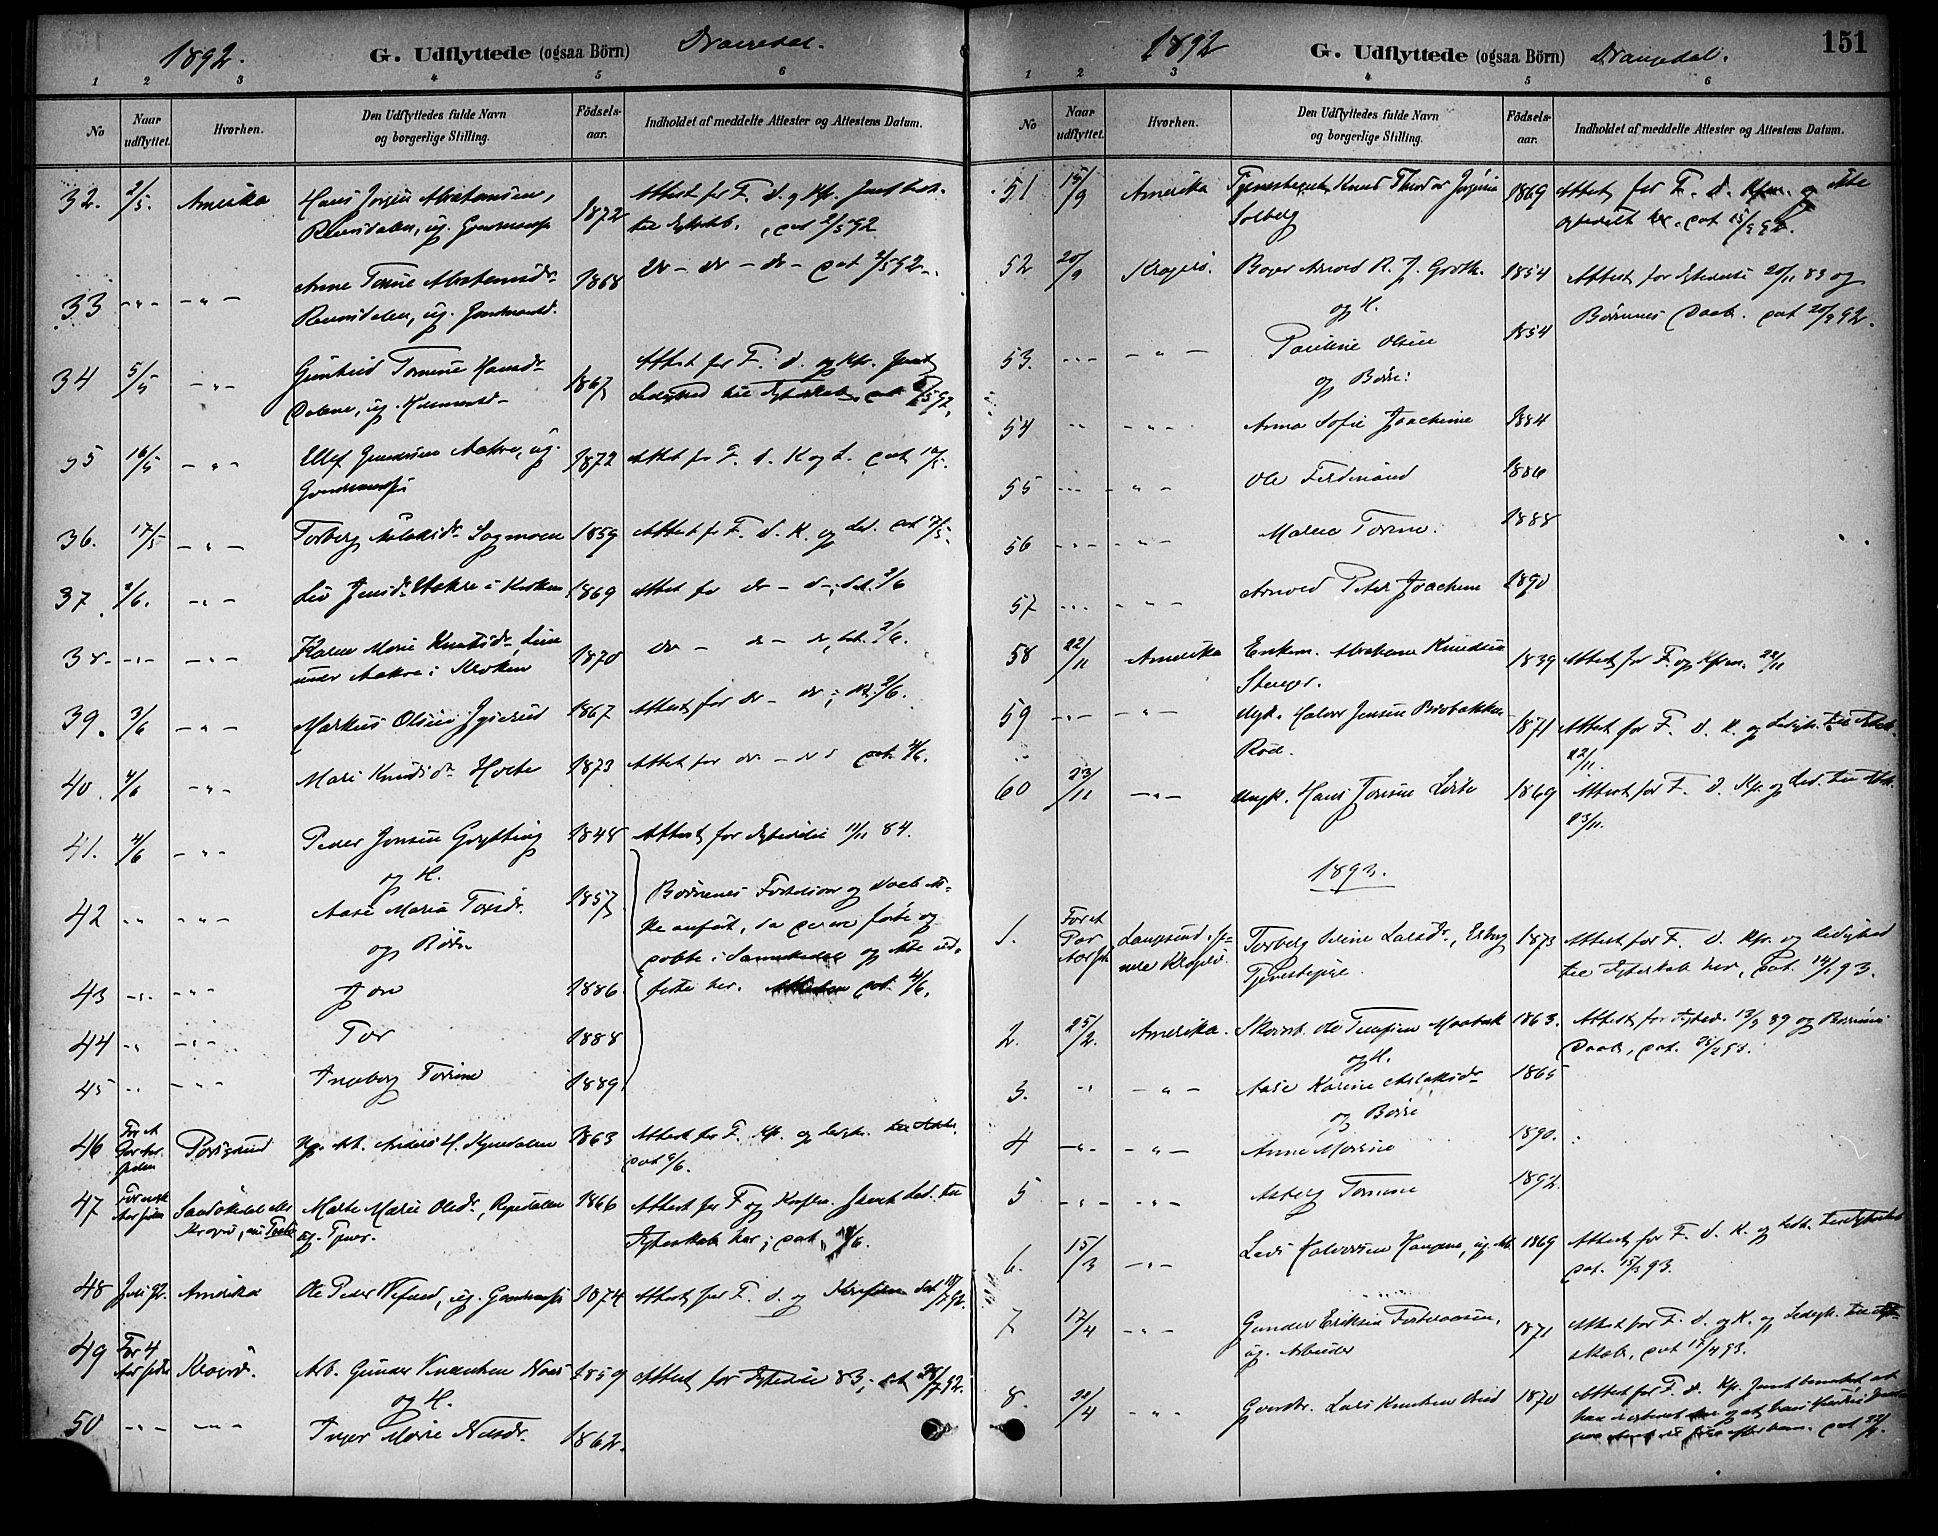 SAKO, Drangedal kirkebøker, F/Fa/L0011: Ministerialbok nr. 11 /1, 1885-1894, s. 151